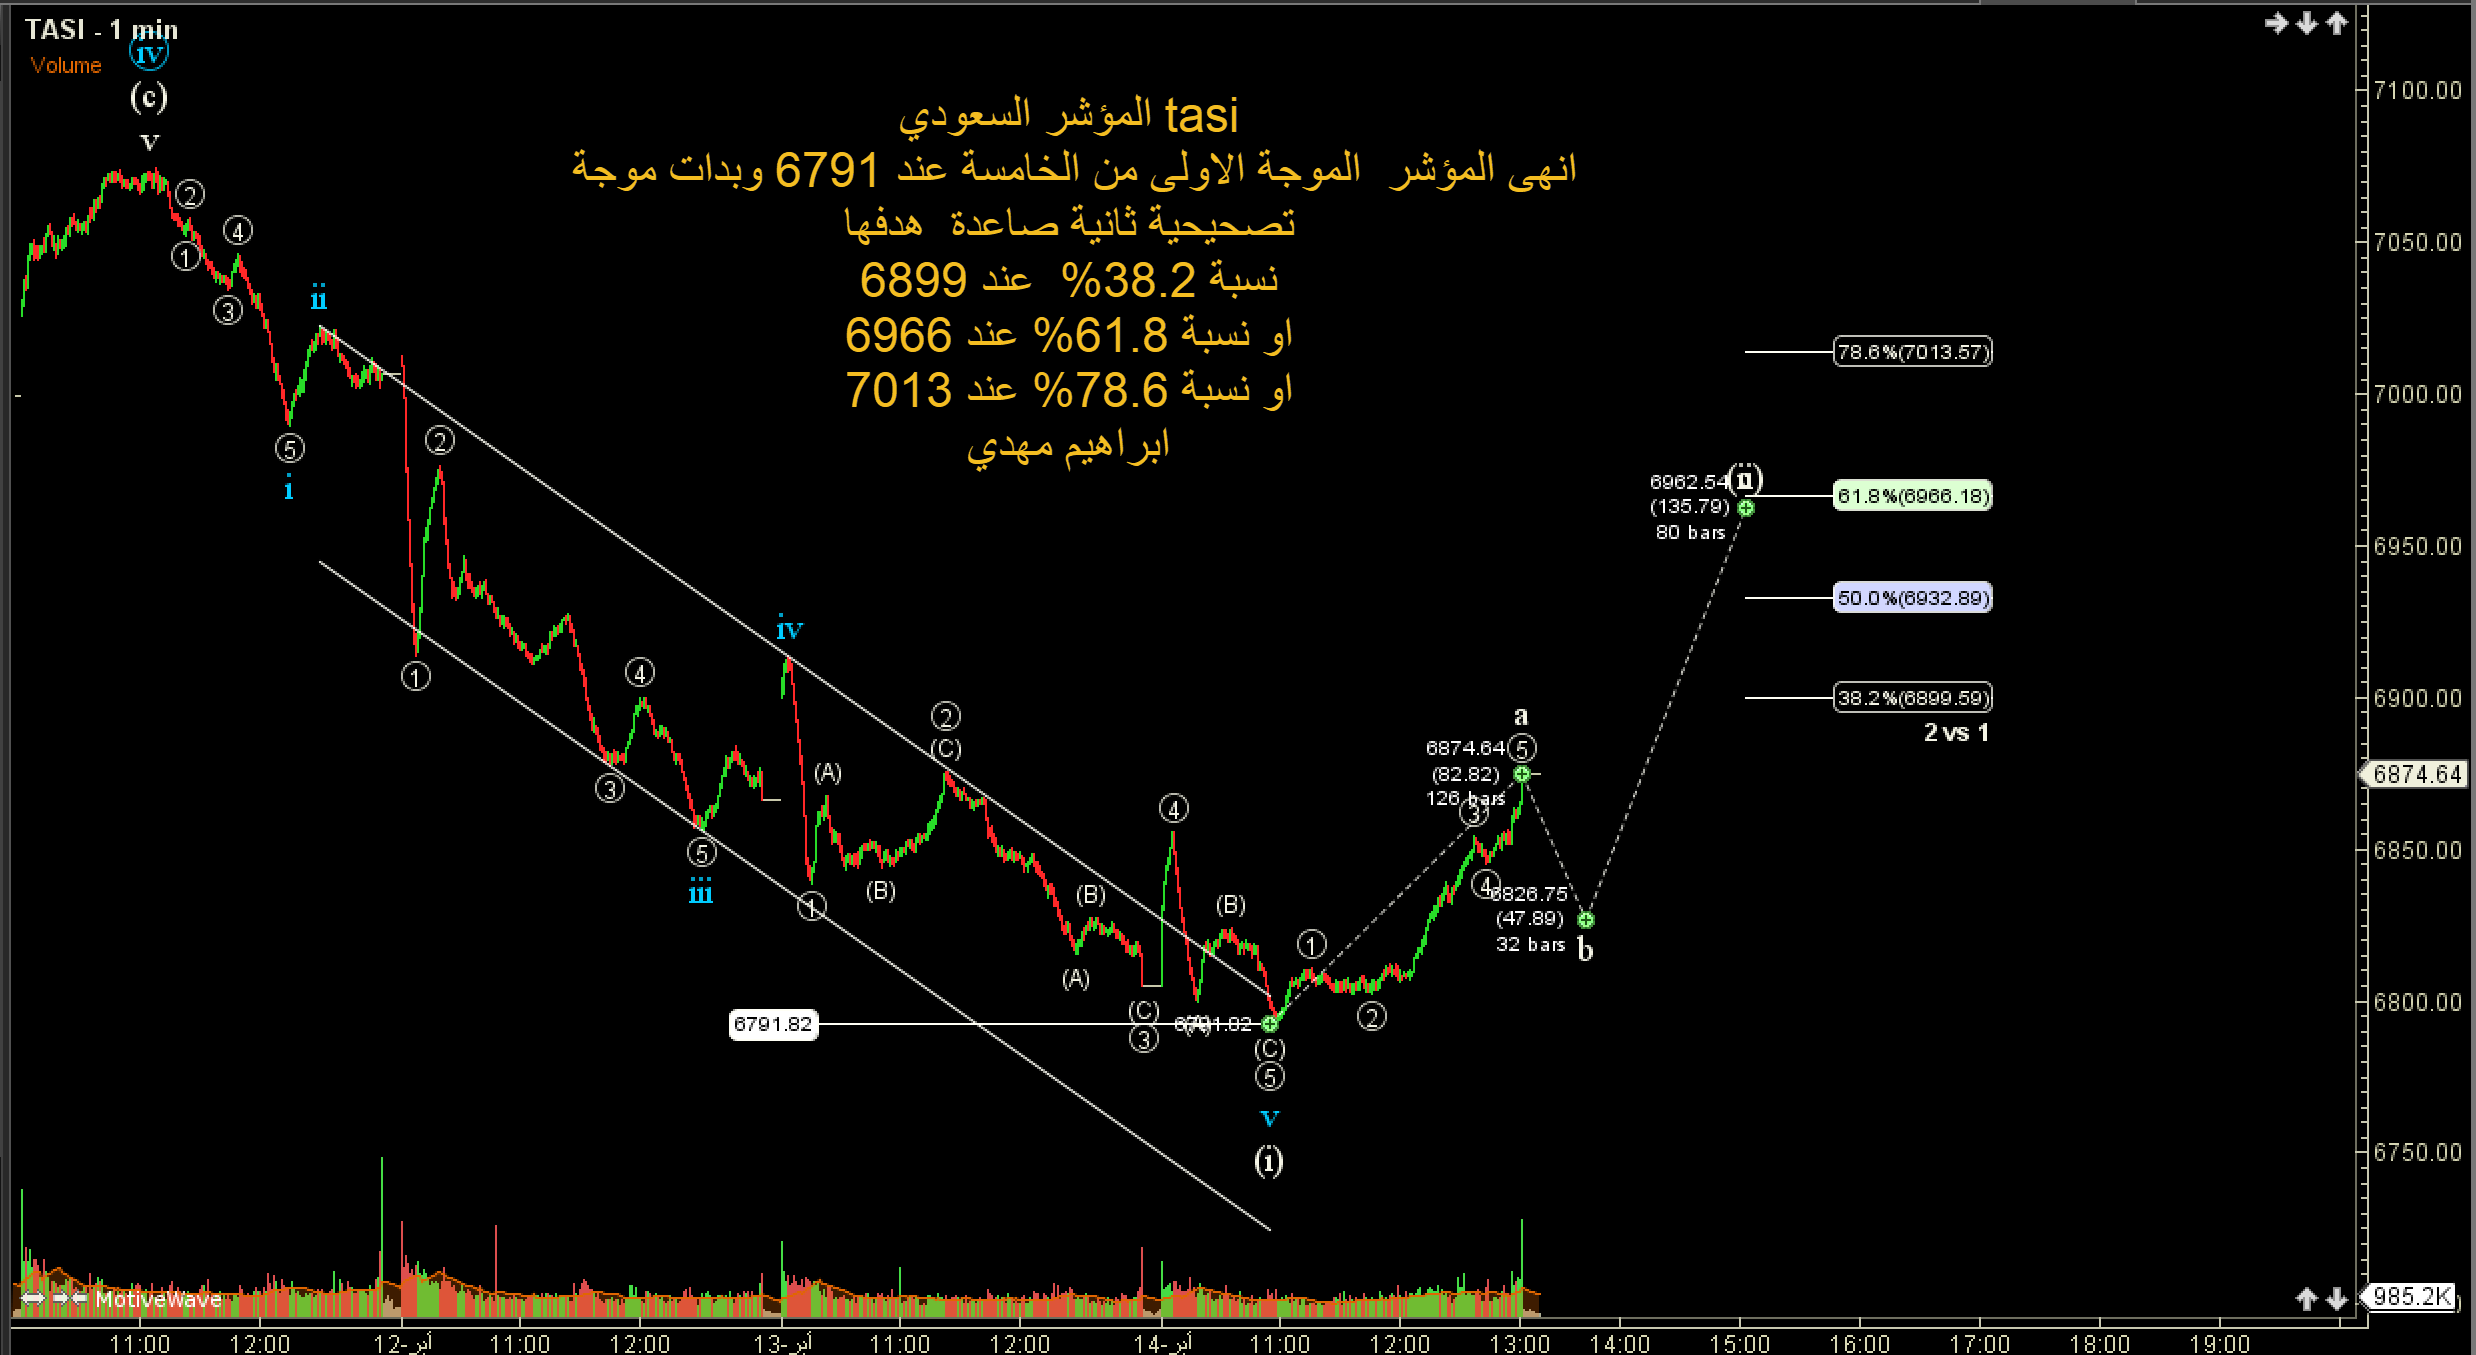 رد: تحليل مؤشر السوق السعودي tasi